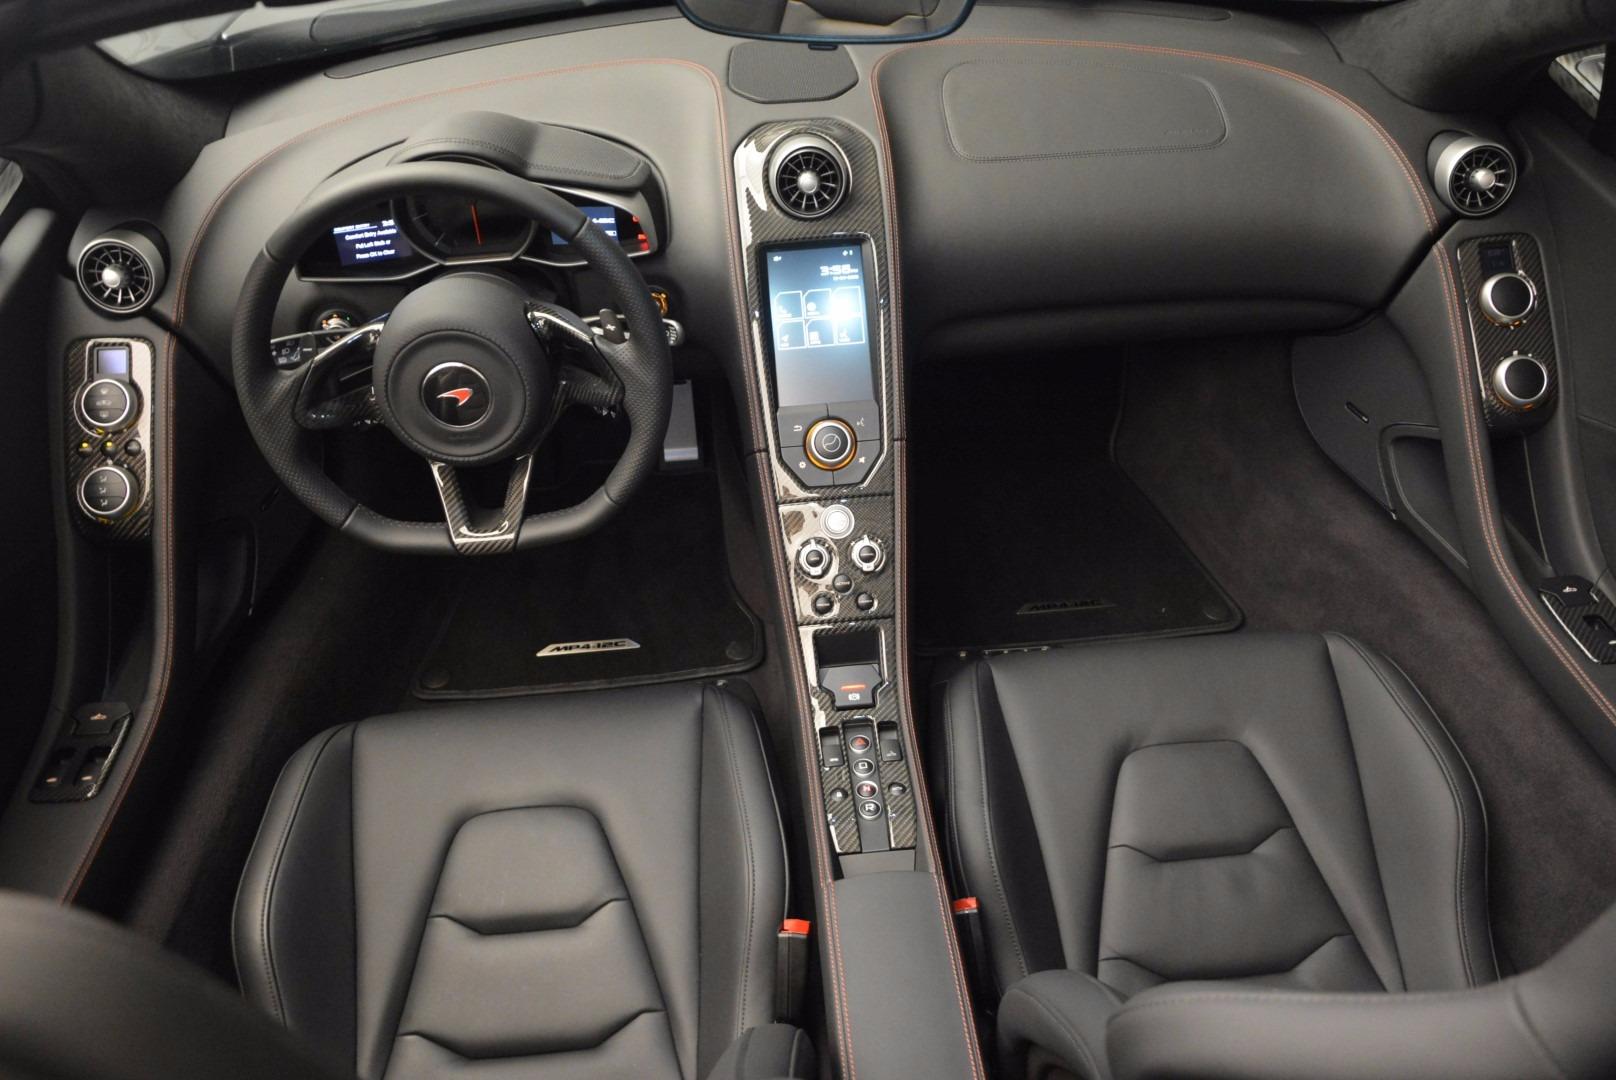 Used 2014 McLaren MP4-12C Spider  For Sale In Greenwich, CT. Alfa Romeo of Greenwich, 3089 627_p25